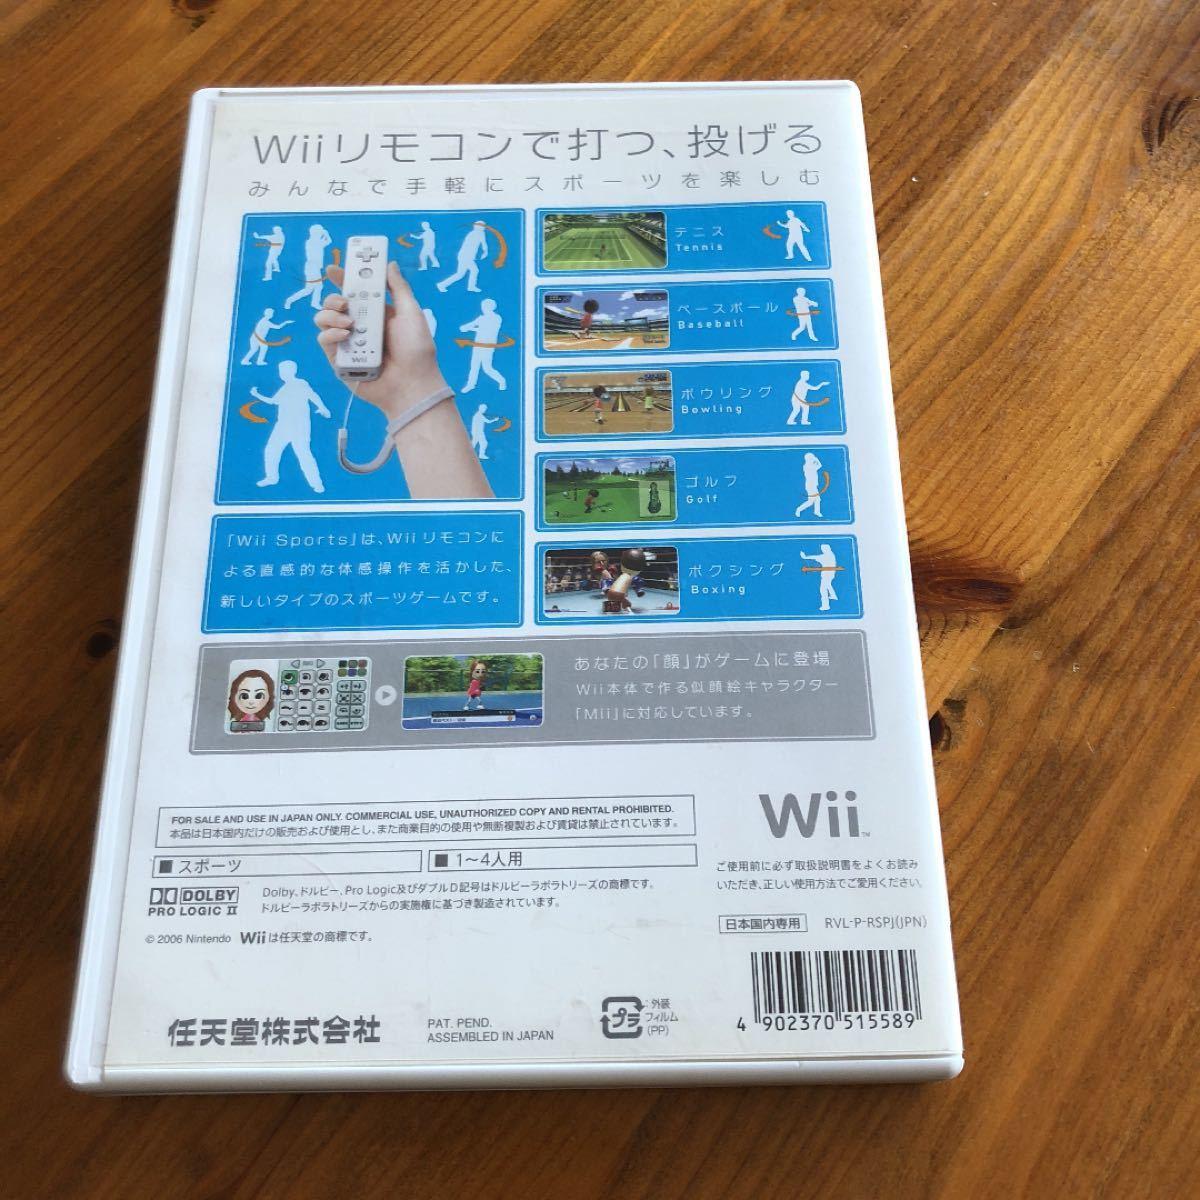 Wiiスポーツ Wiiソフト Wii Sports